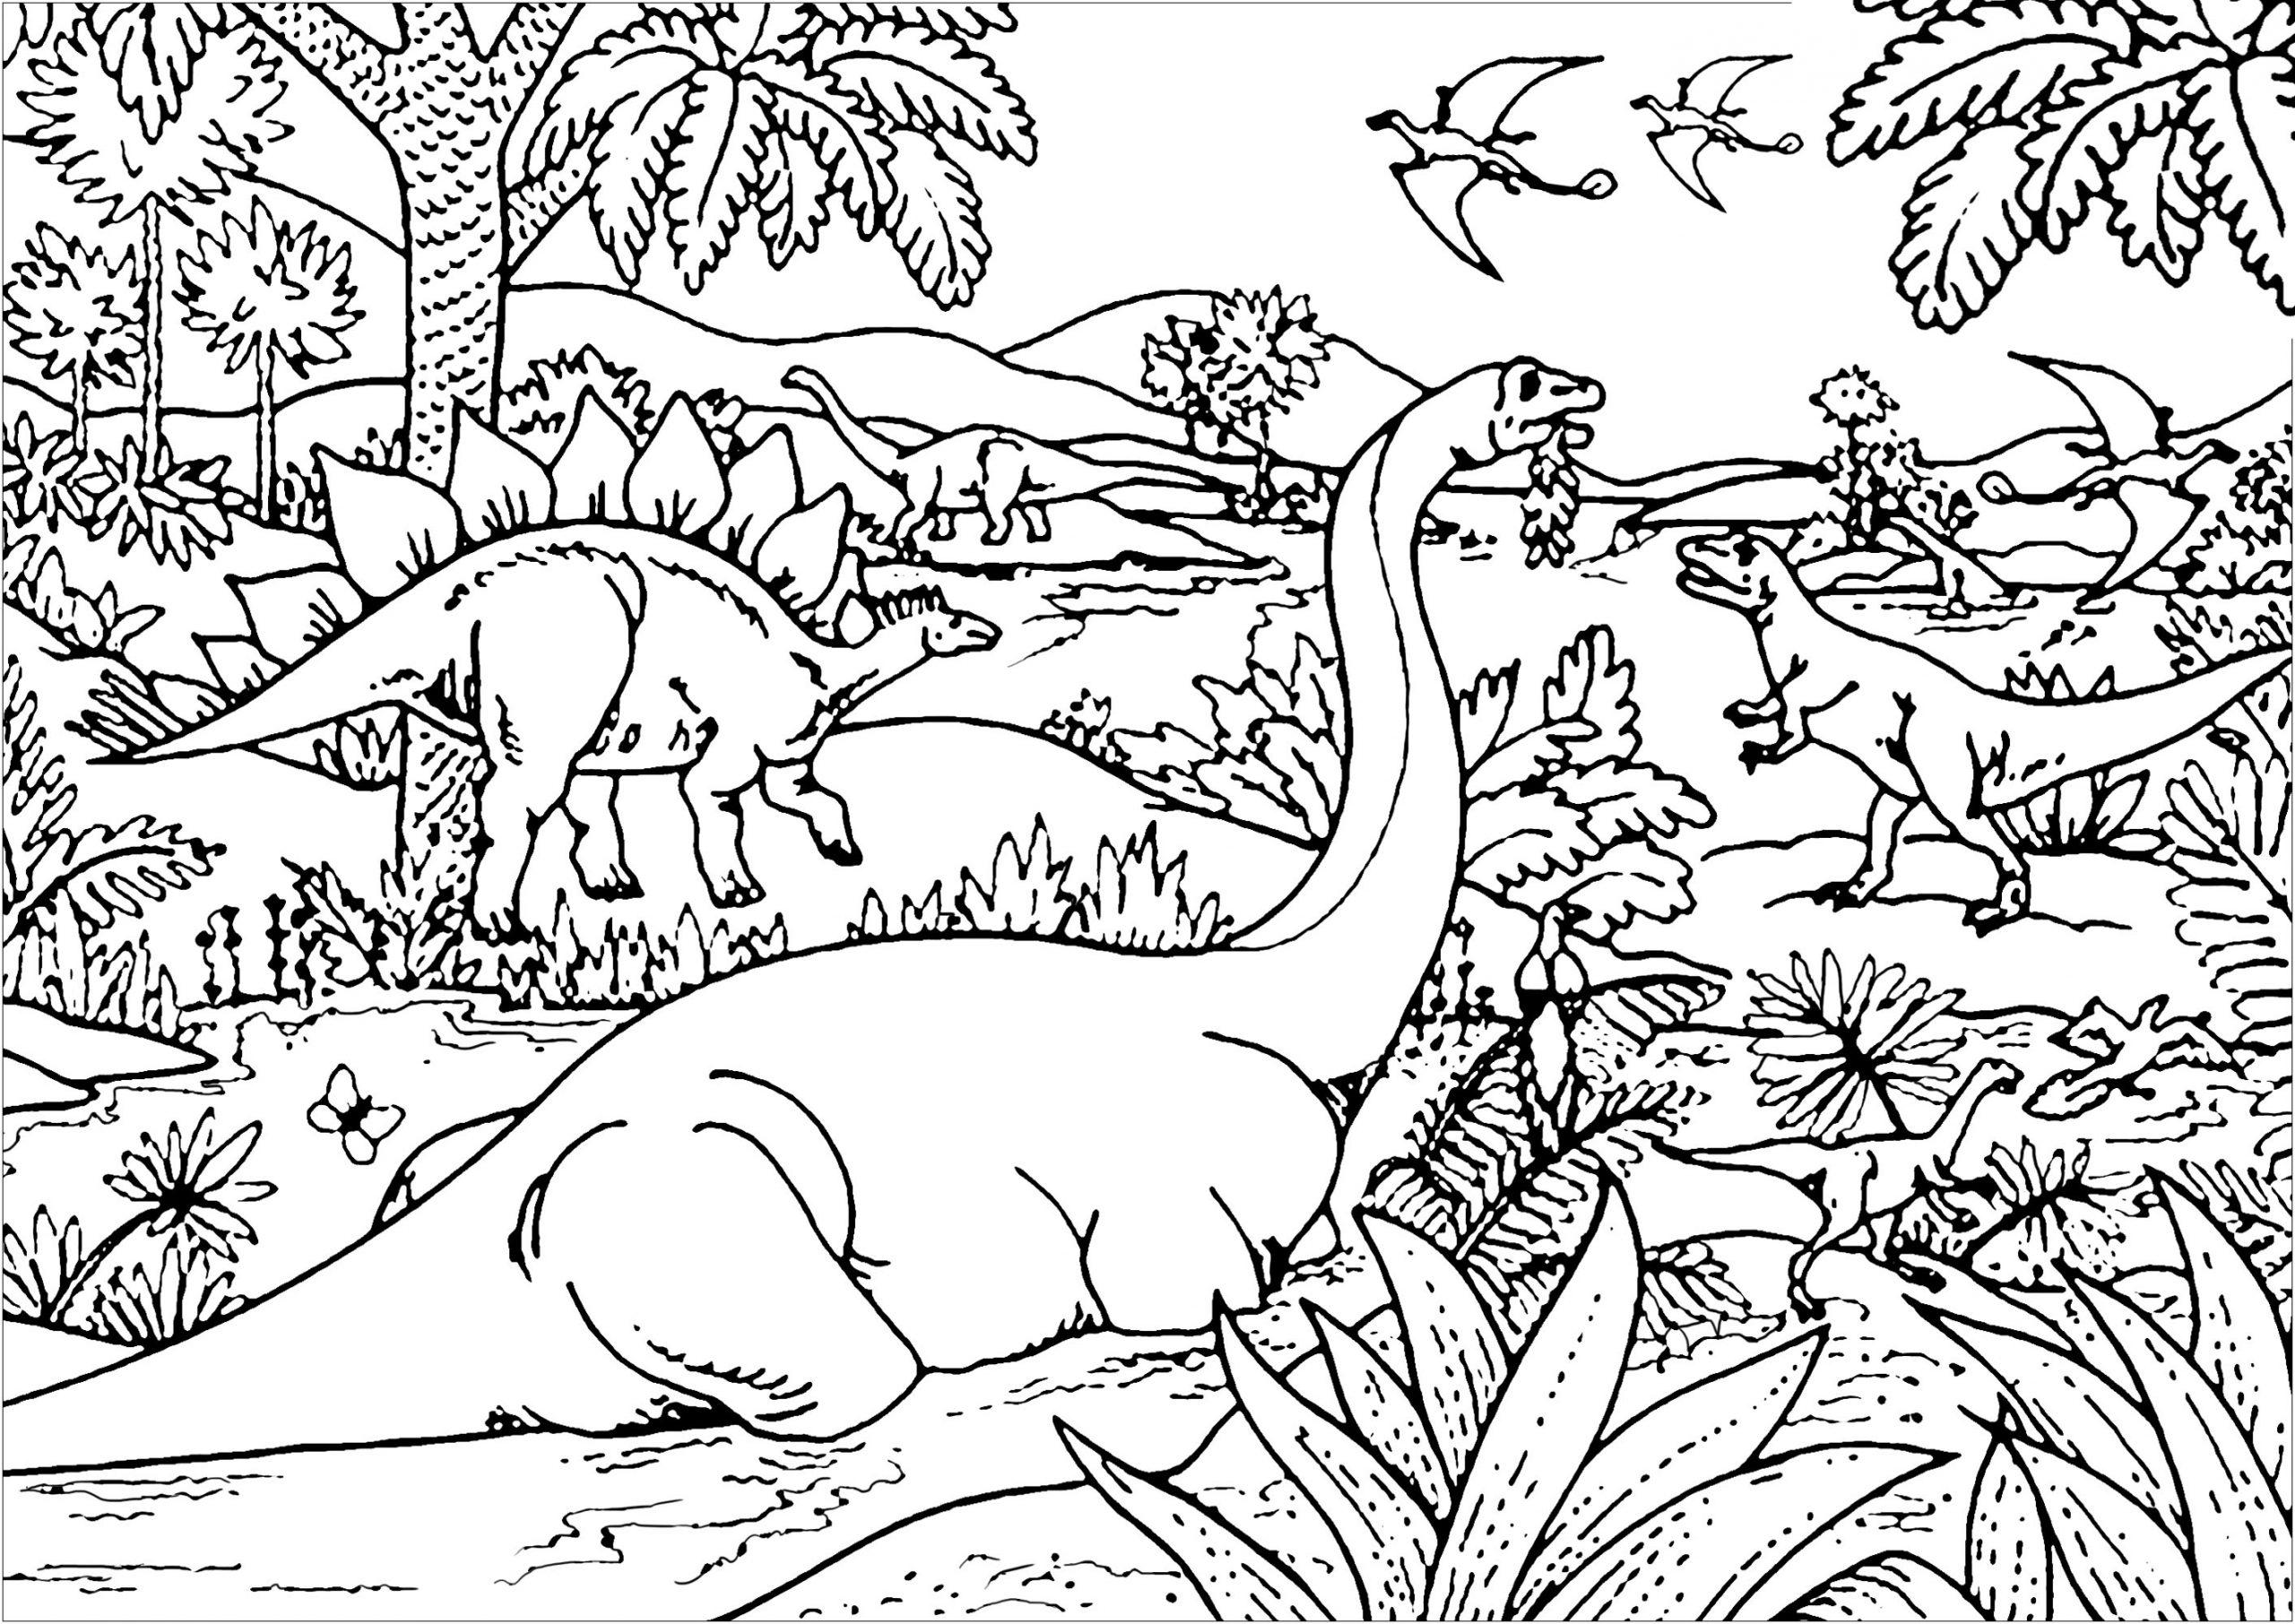 Dinosaurier 10703 - Dinosaurier - Malbuch Fur Erwachsene bei Mandala Dino